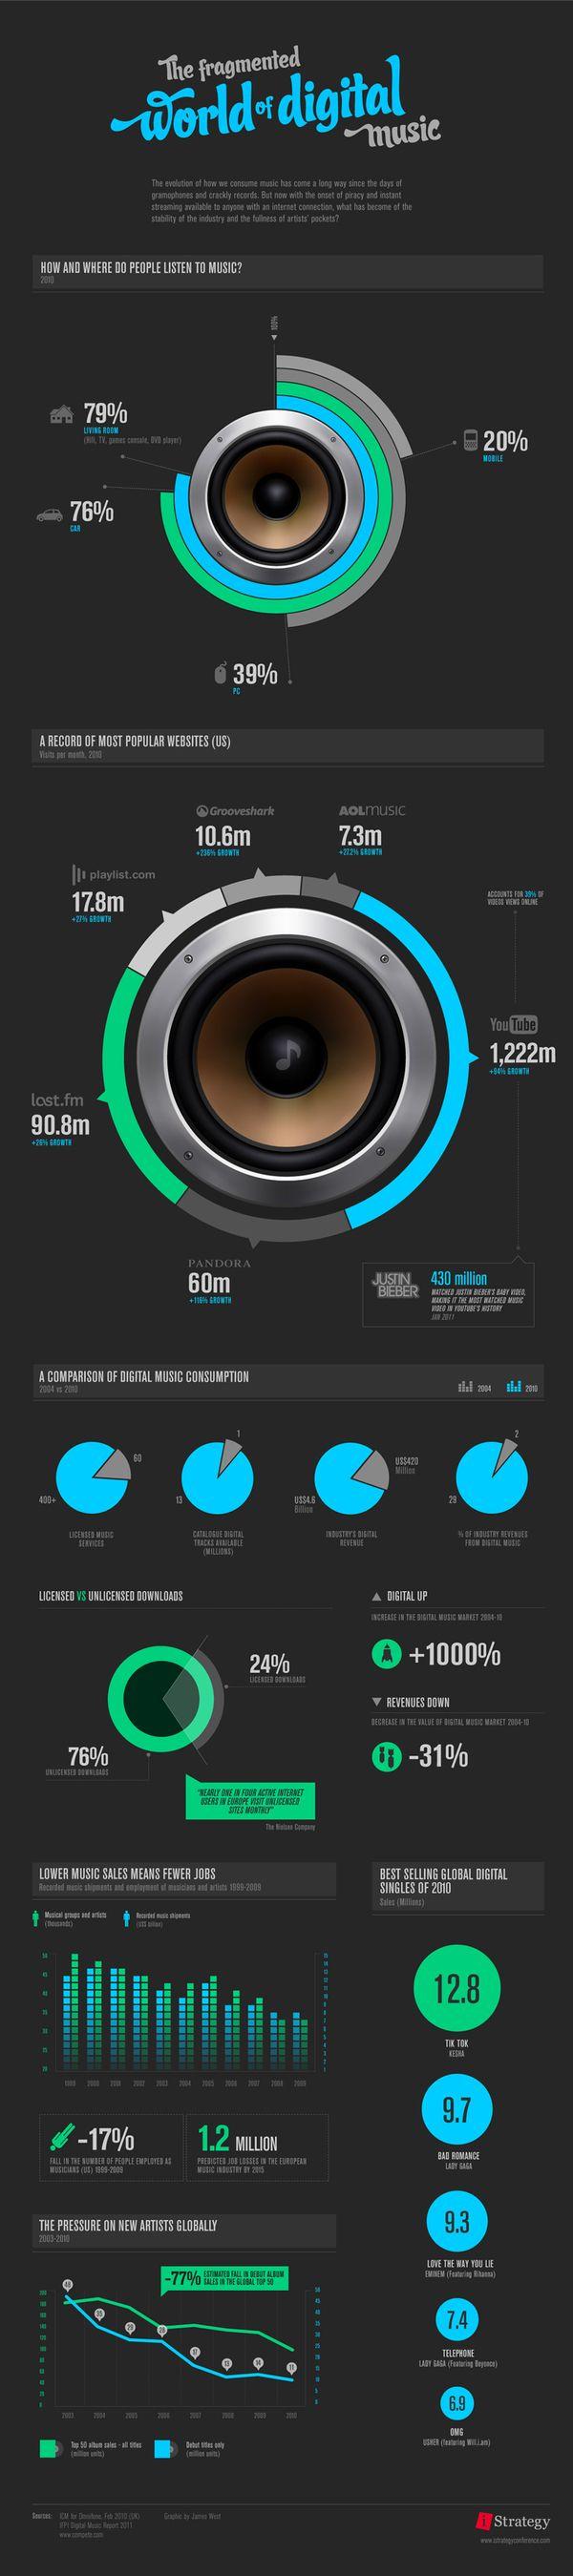 #Digital #Music Stats –#Infographic: James West, Web Design, Data Visual, Digital Music, Infographic Uidesign, Fragments, Music Infographicworkscom, Retrato-Port Digital, Music Industrial